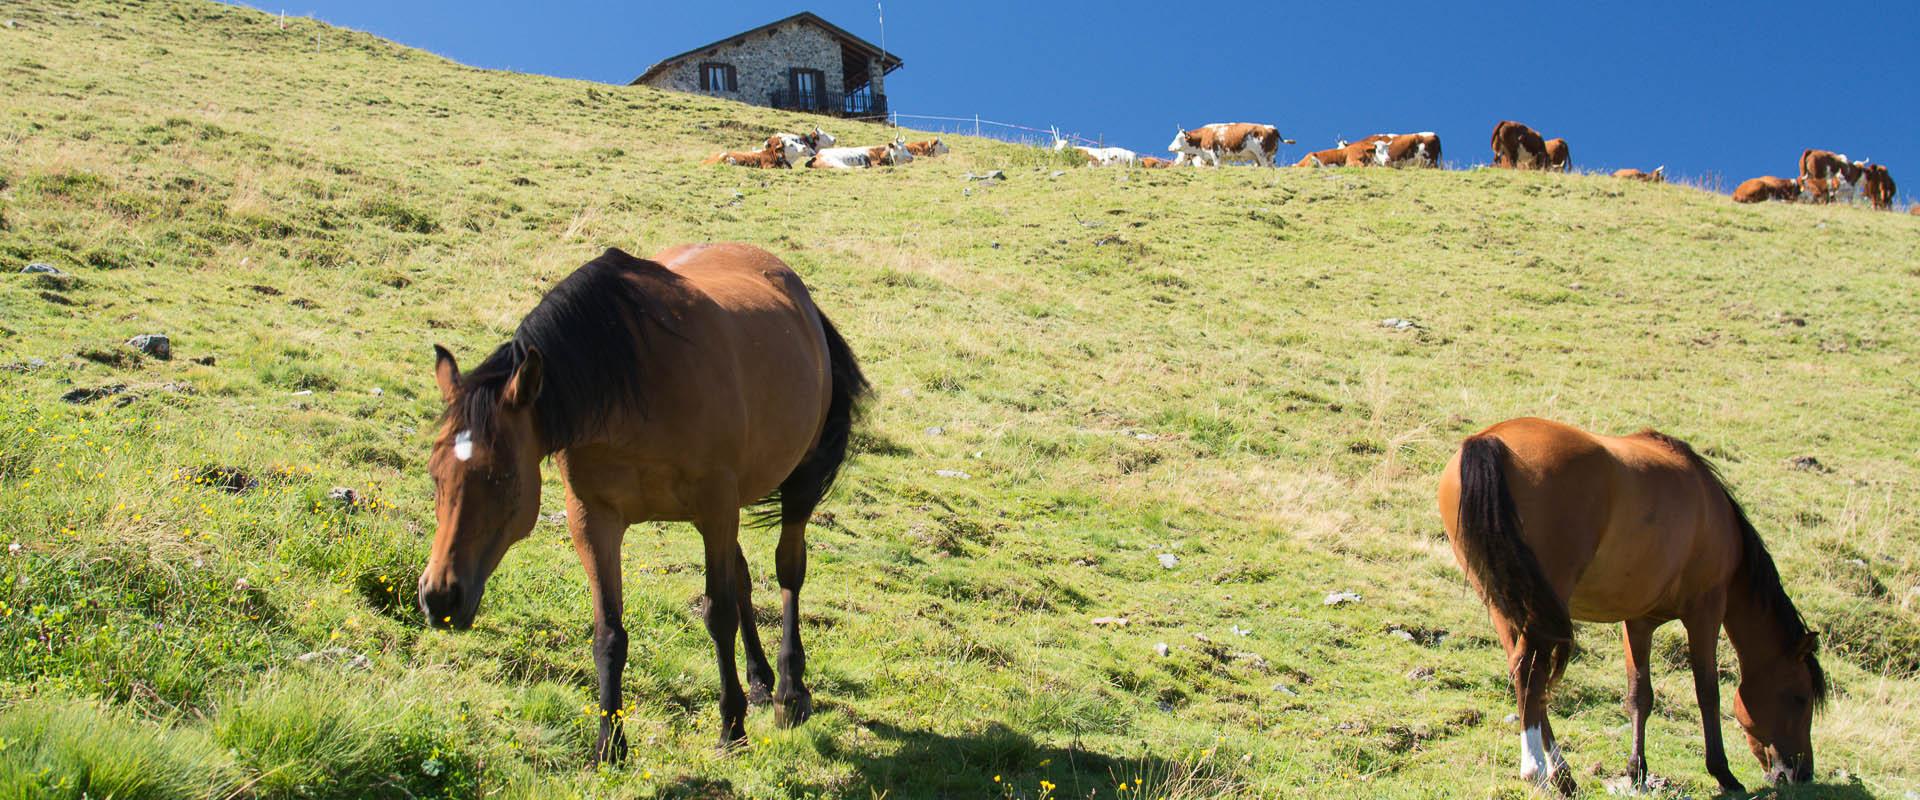 cavalli-spirit-viky-al-pascolo-agriturismo-alpemoncerchio